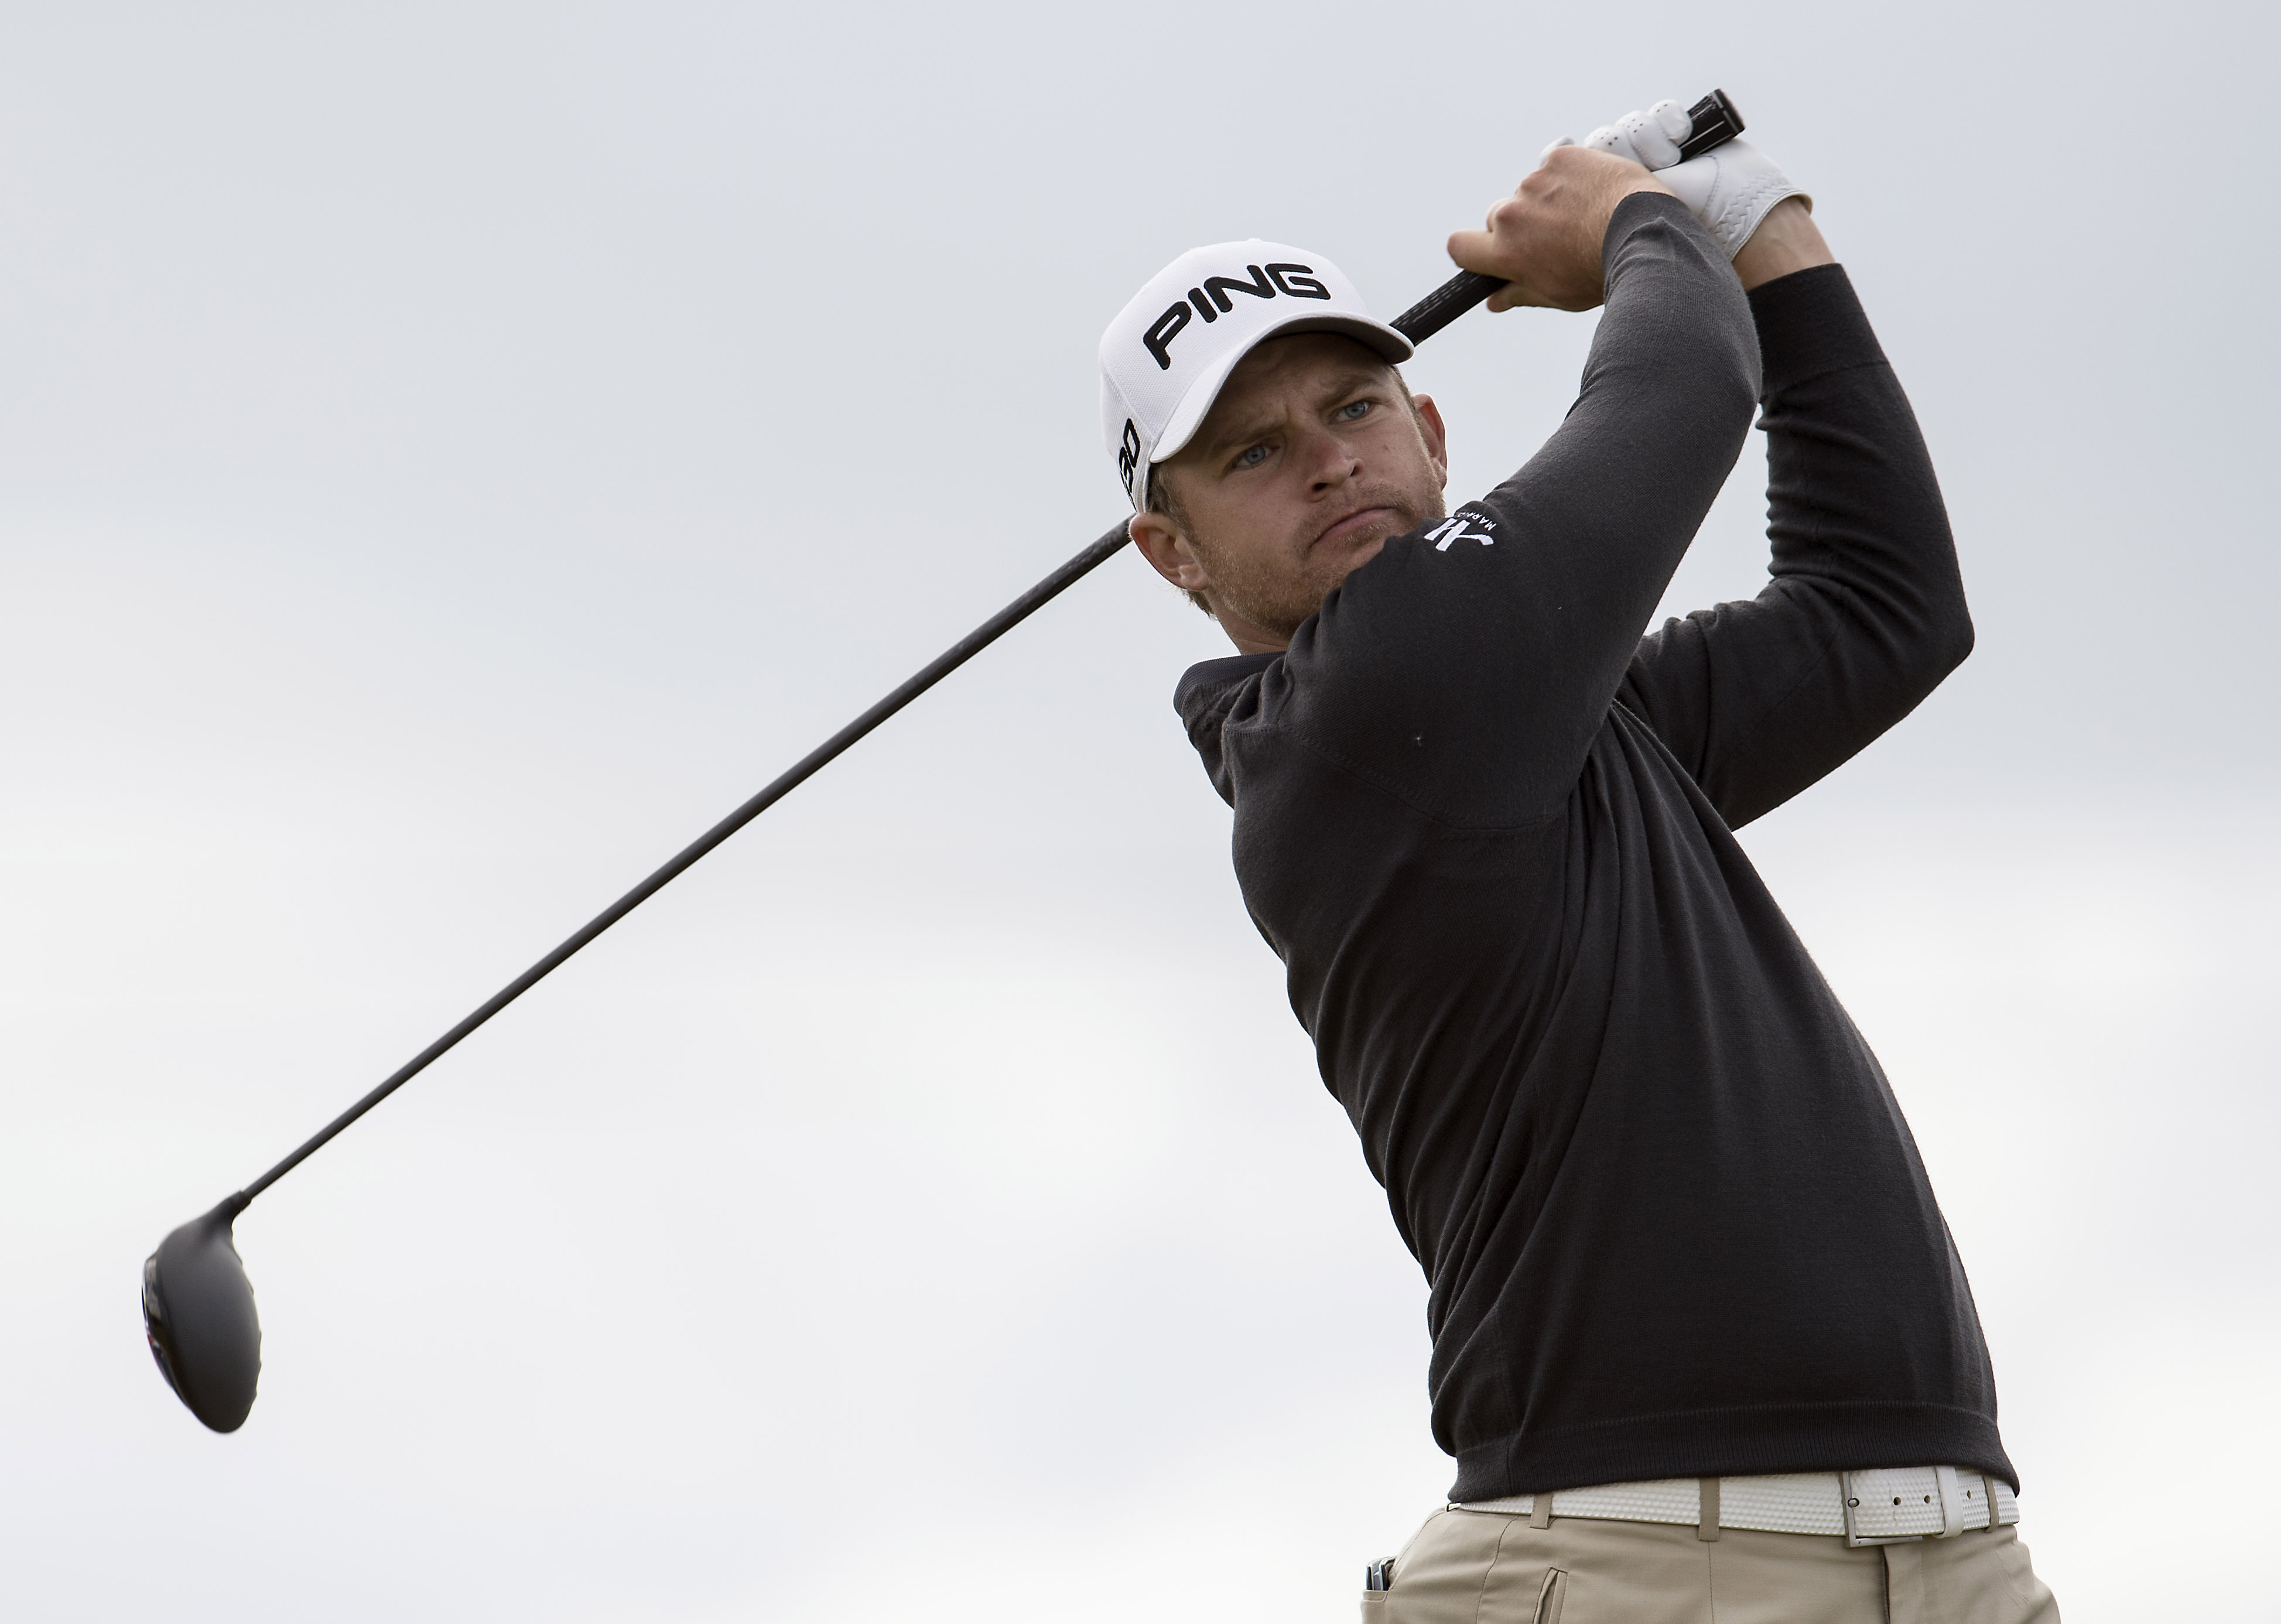 England's Tom Lewis during the third round of the European Tour Golf Tournament in Himmerland, Denmark, Saturday, Aug. 16, 2014. (AP Photo/Rene Schutze, POLFOTO) DENMARK OUT